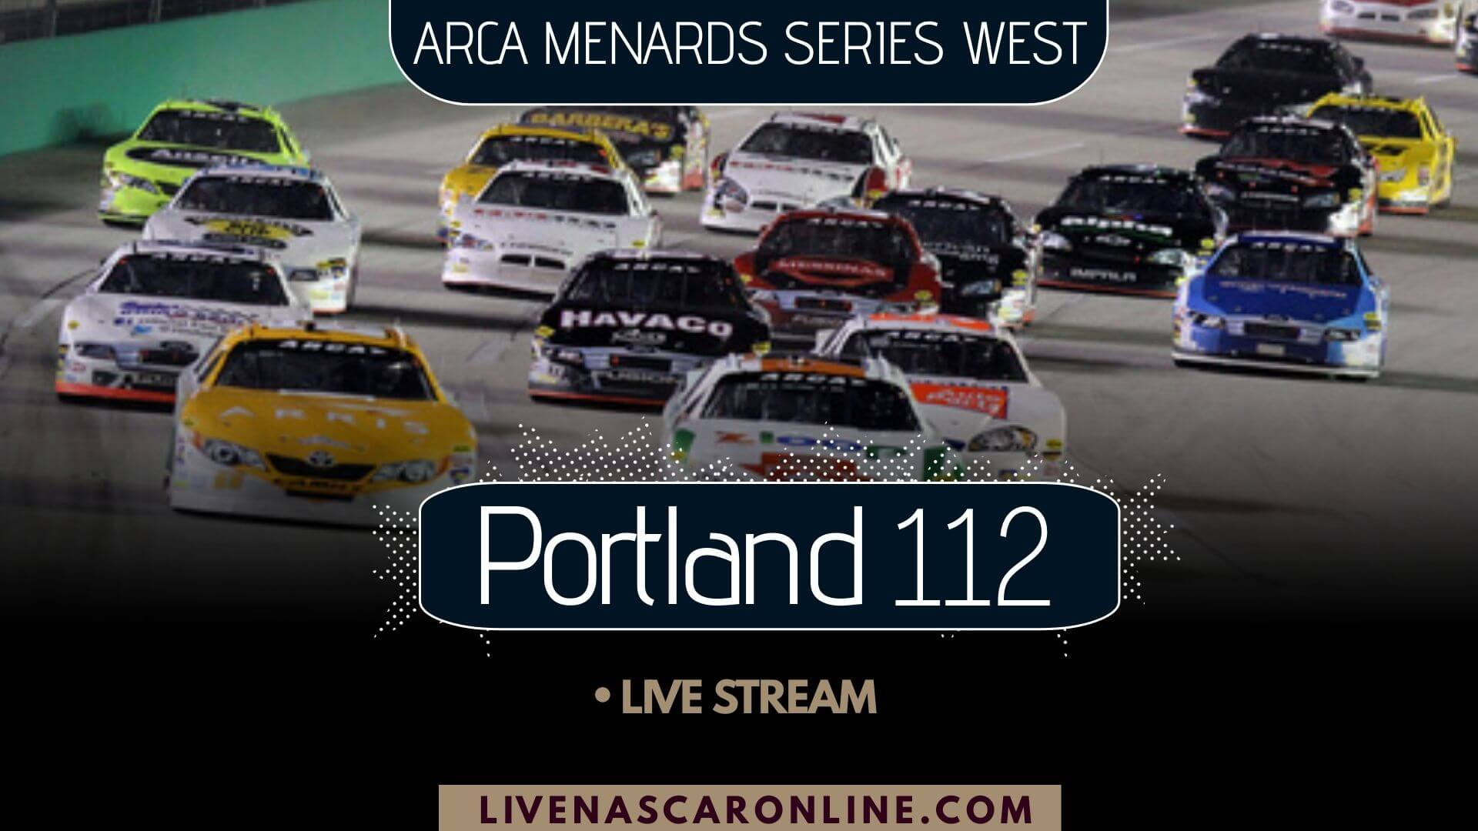 Portland 112 ARCA Race Live Stream